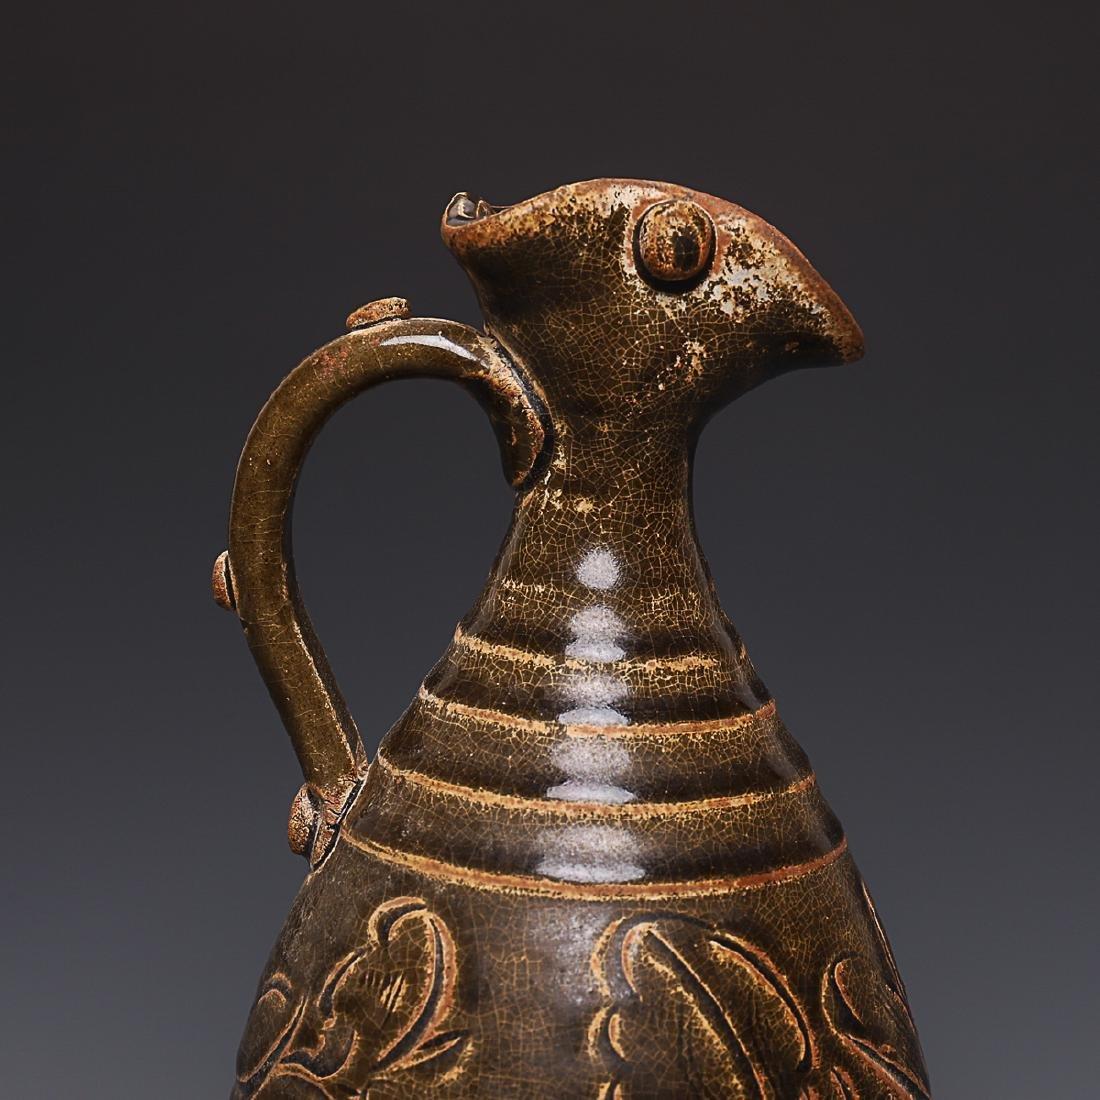 Vintage Chinese Porcelain Pot - 5